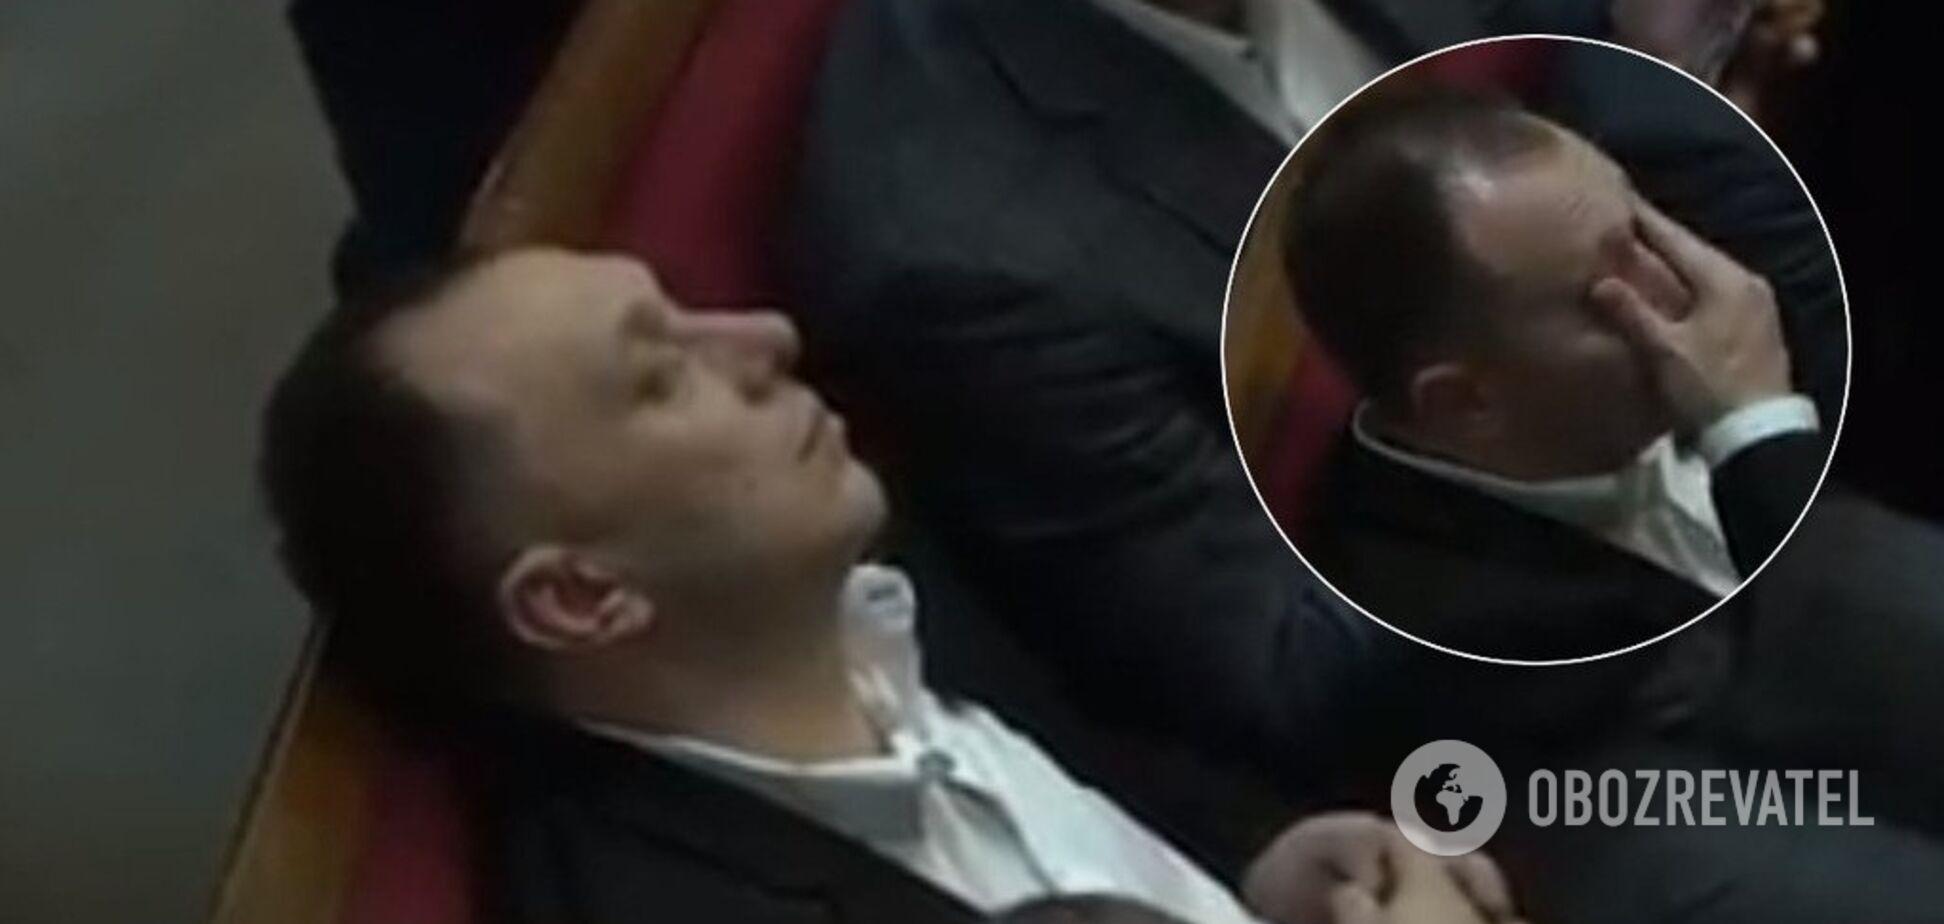 'Я не спал!' Отдых 'слуги' в Раде засняли на видео: он нелепо оправдался